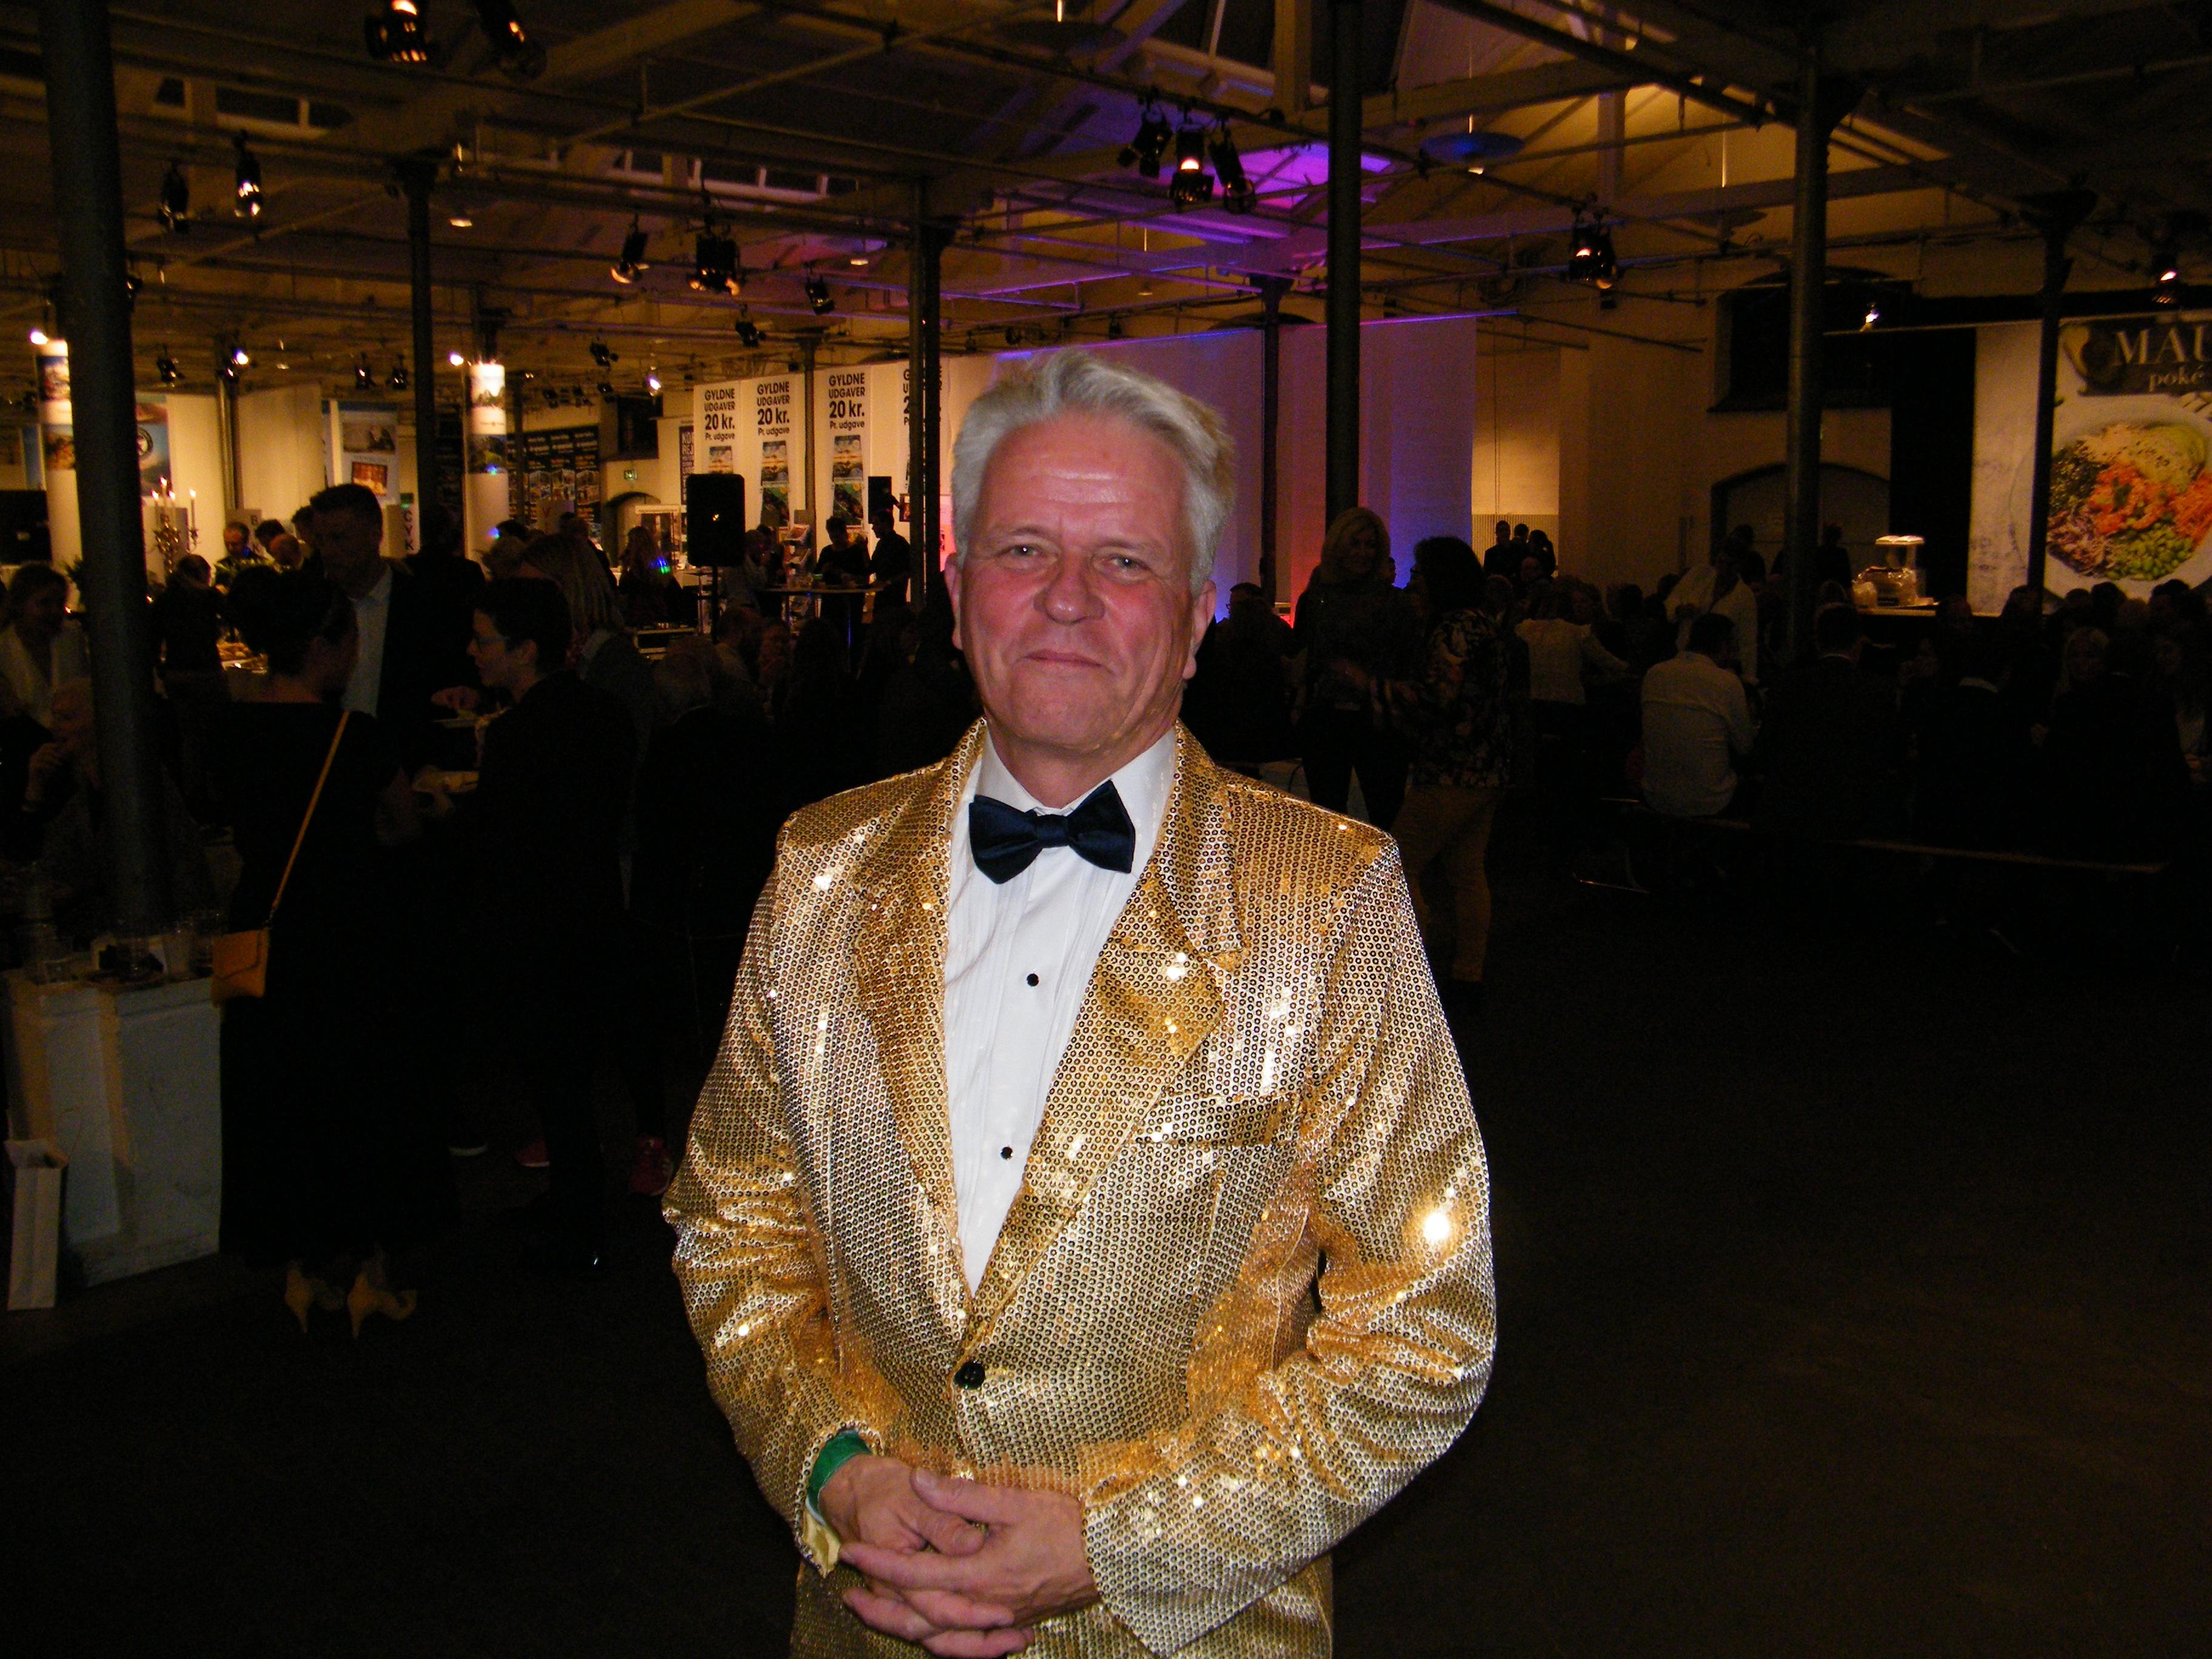 Administrerende direktør i DRF, Lars Thykier,, i sin iøjnefaldende guldjakke fra New York ved DRF's jubilæum i Øksnehallen. Foto: Henrik Baumgarten.